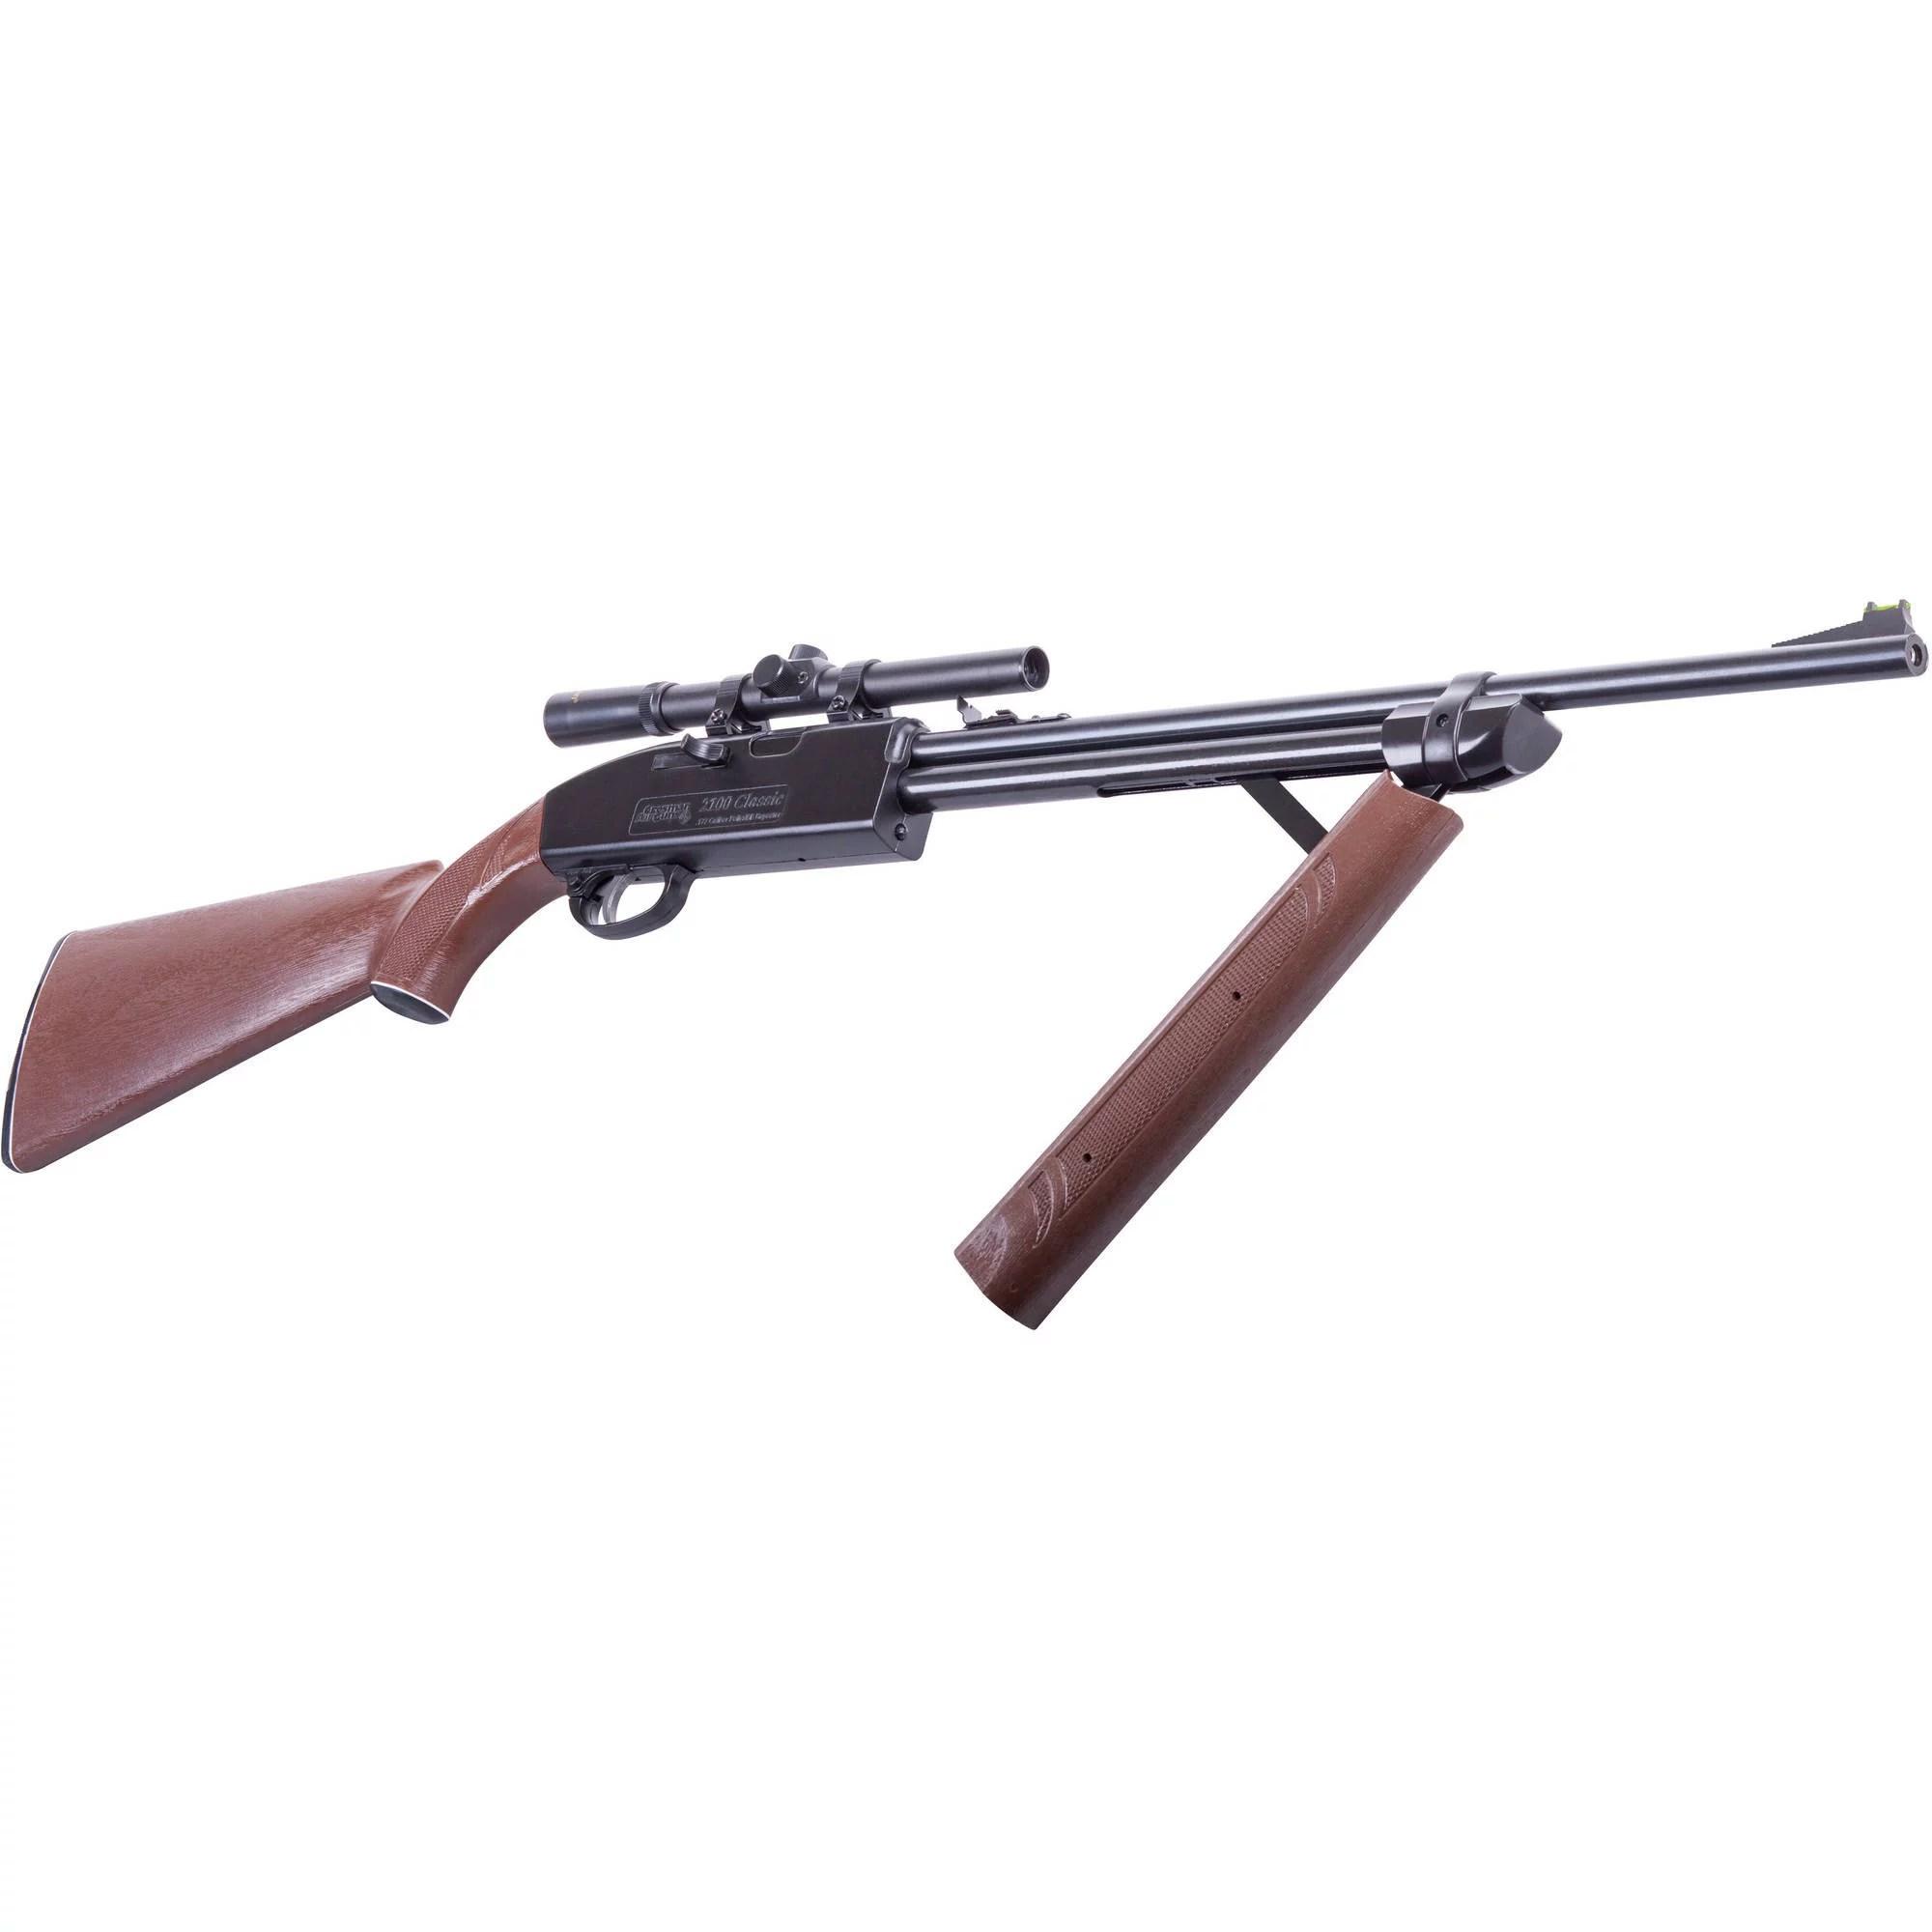 hight resolution of crosman 2100 classic variable pump 177cal air rifle with scope 2100x walmart com